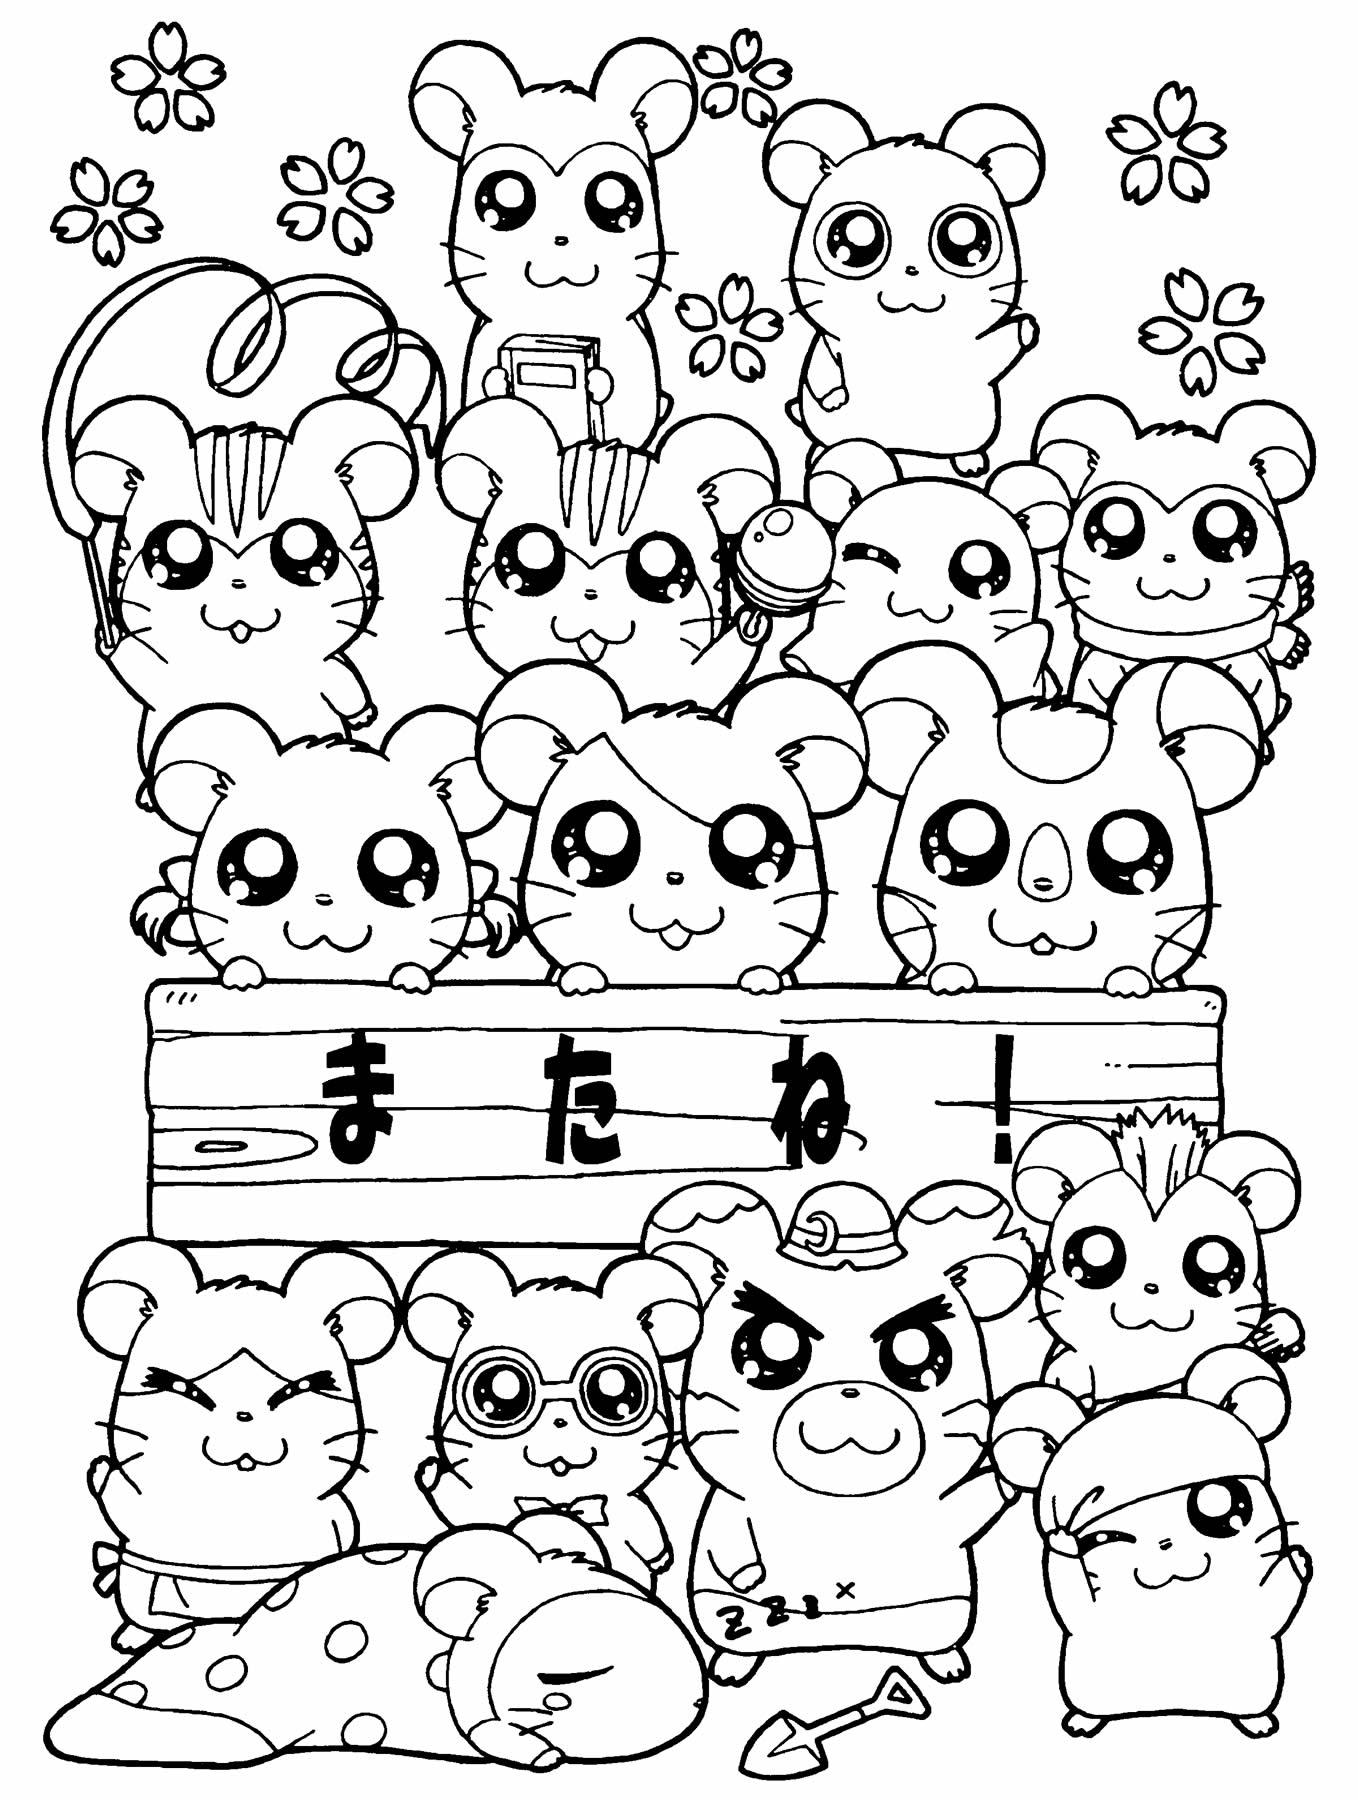 Imagens do Hamtaro para colorir